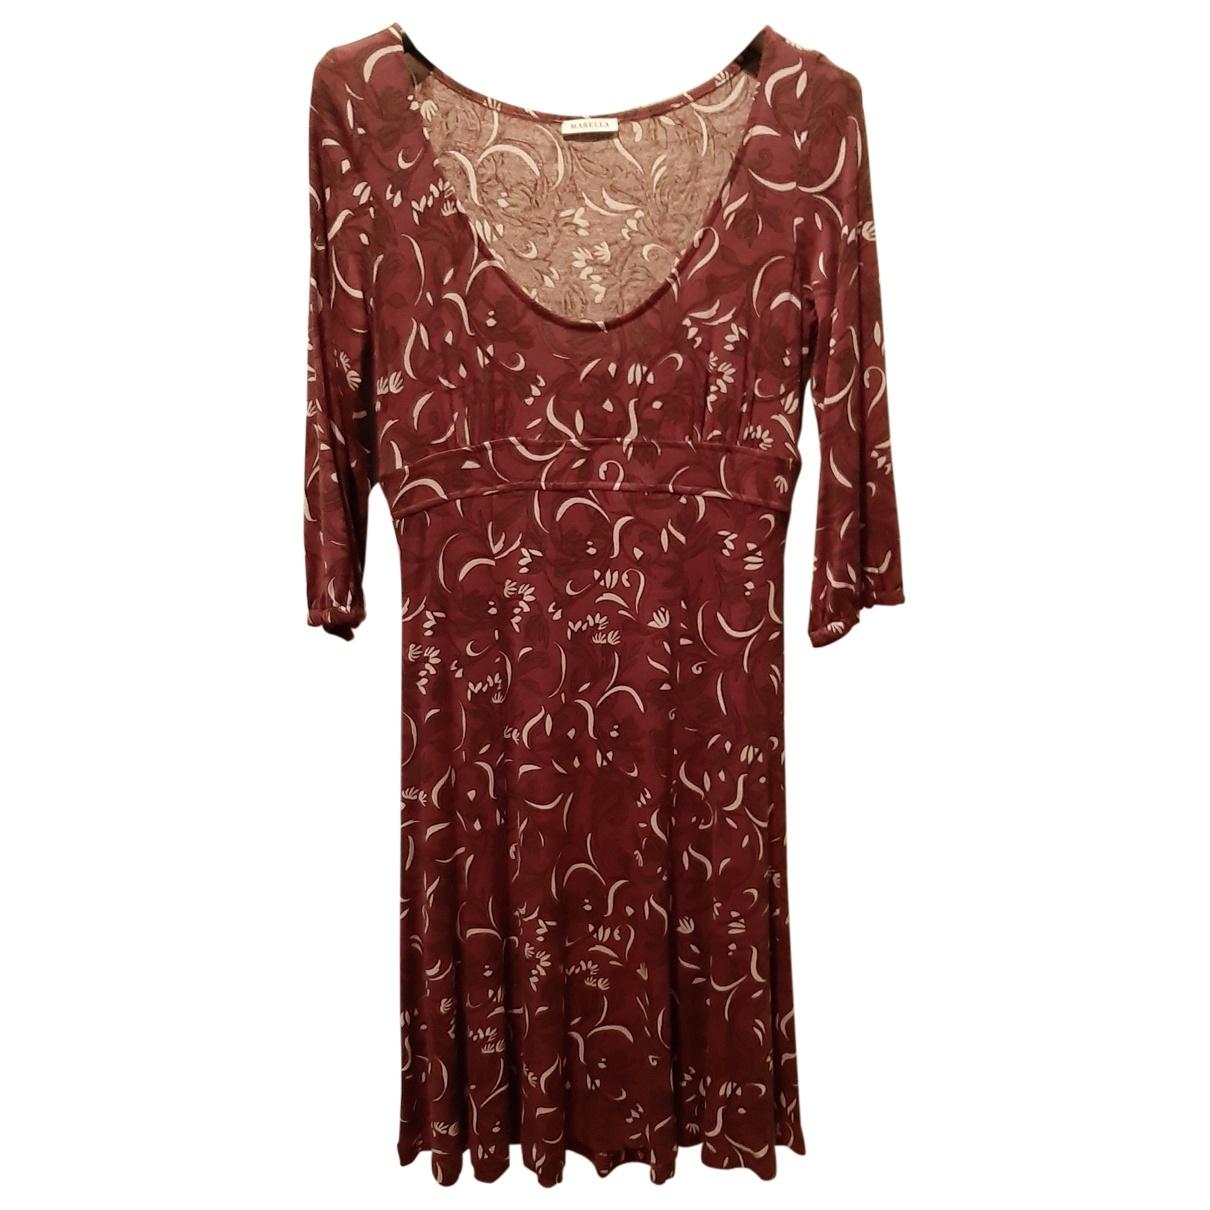 Marella \N Red dress for Women S International